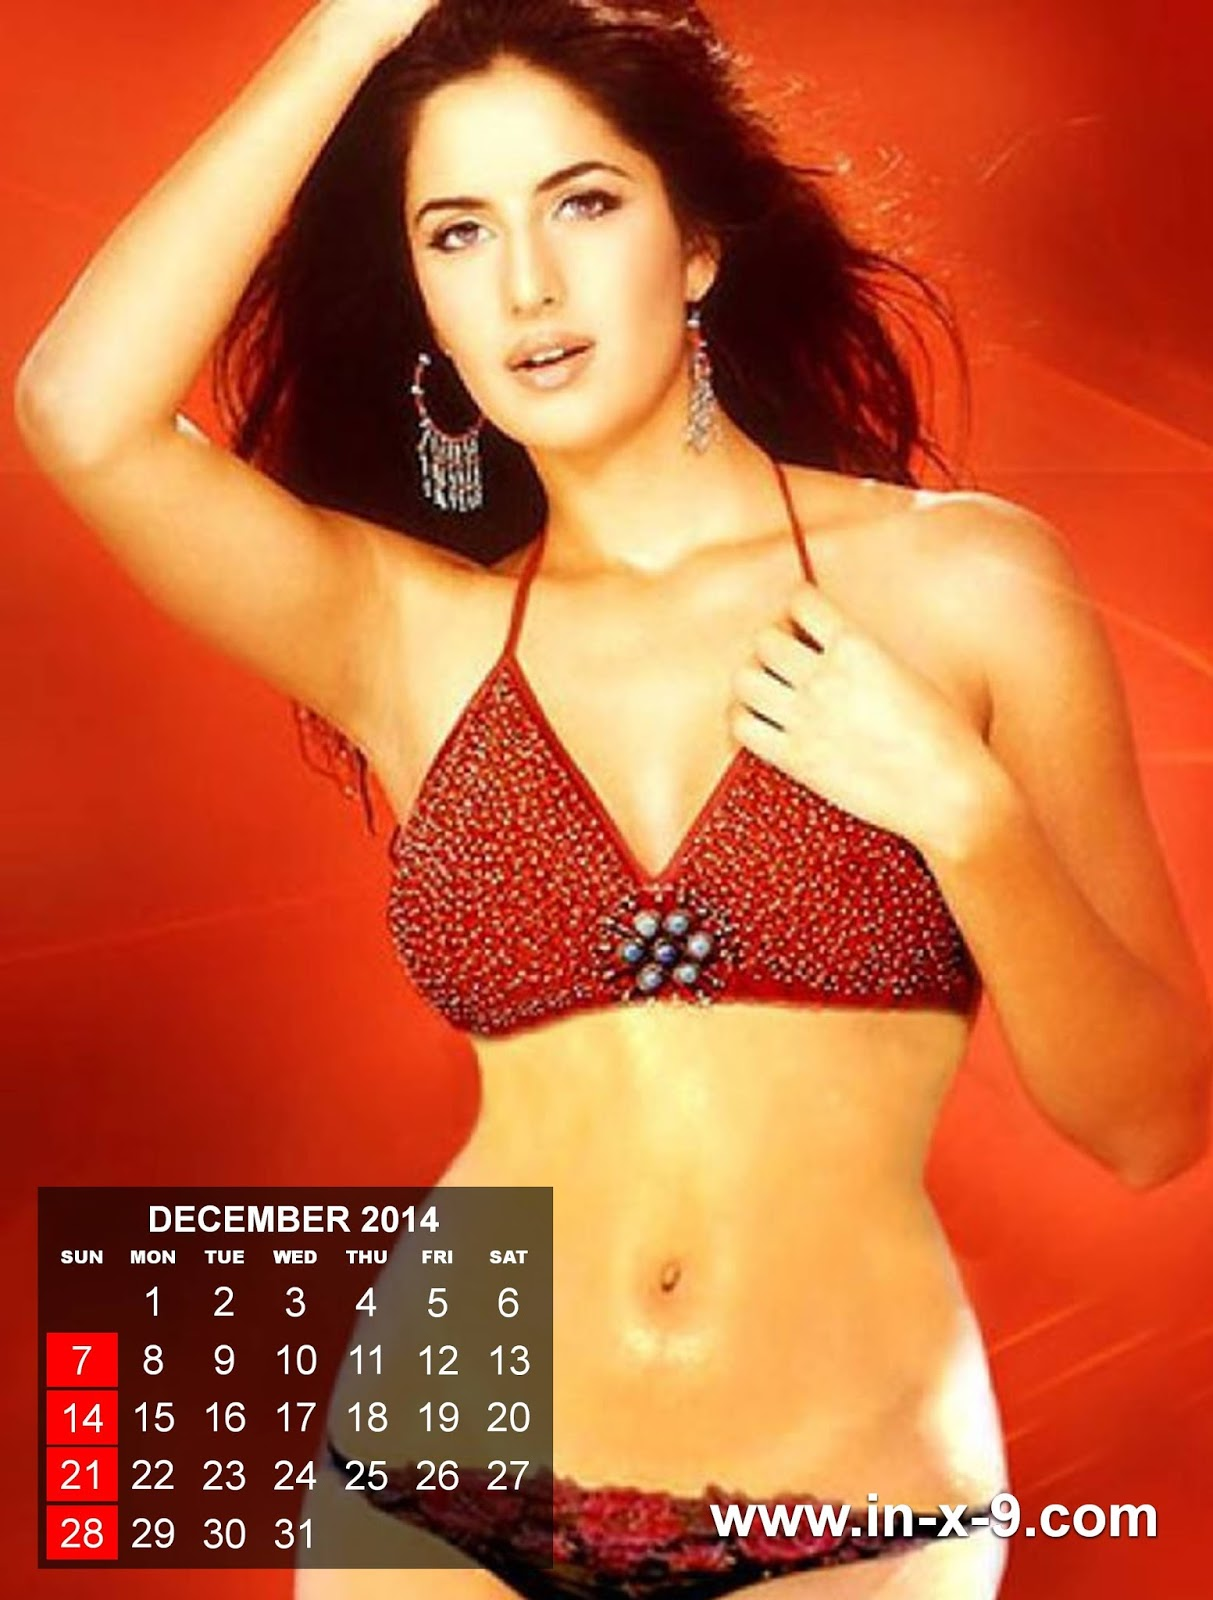 2014+Sexy+Indian+Calendar+3++-+free+2014+calendar++-++free+2014